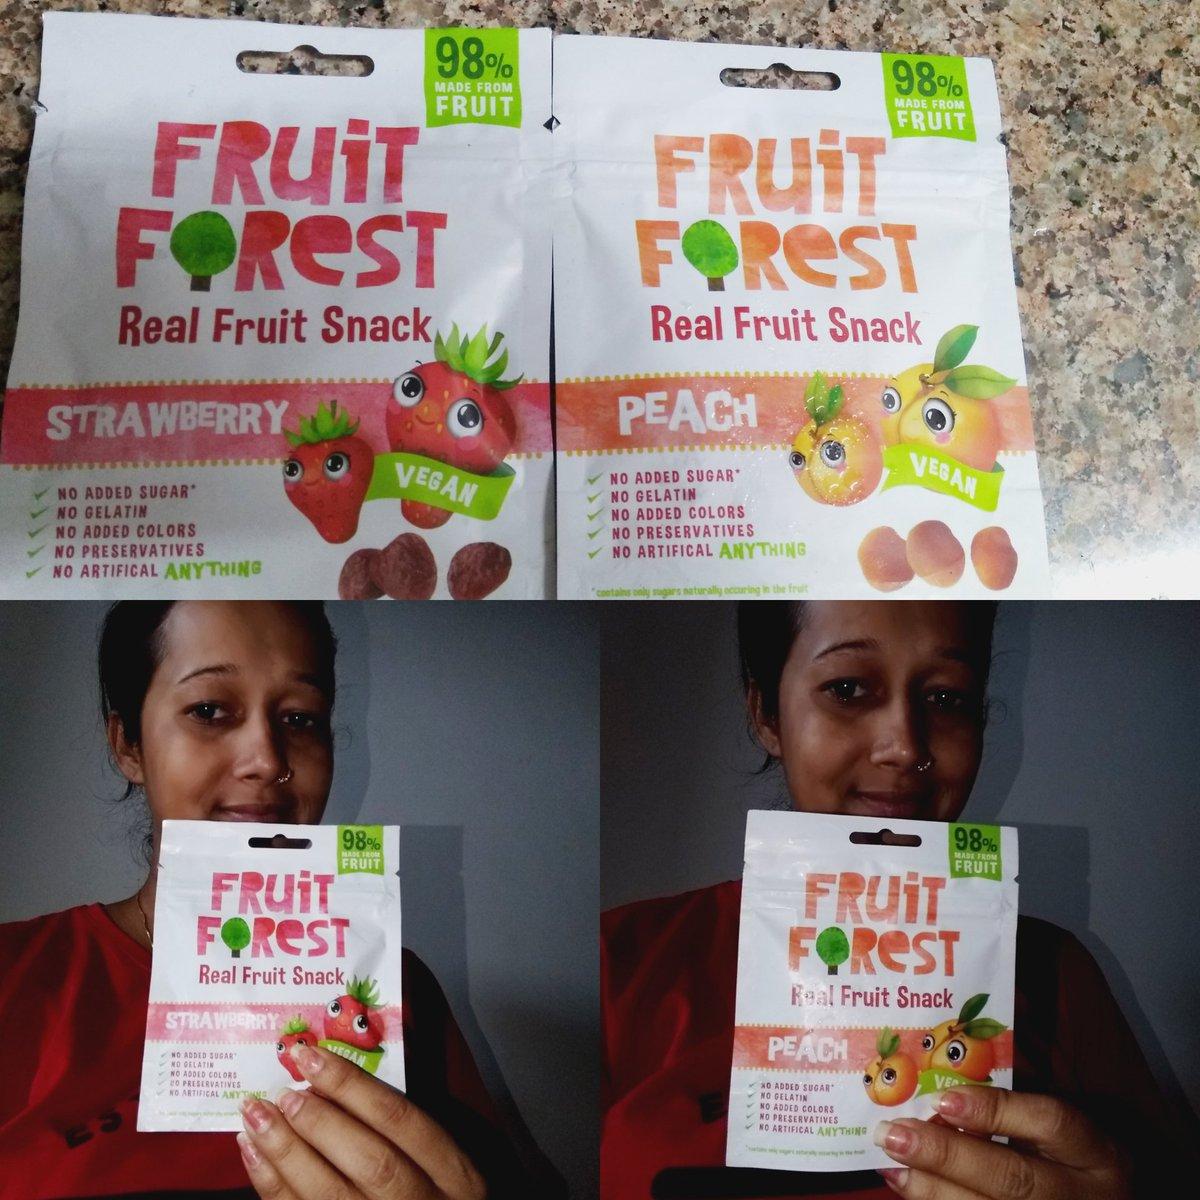 My entry ➡️@fruitforestind ❤️#contest #live #india #contestindia #livenow #fruitforest #amazon #voucher #win #selfie #selfiecontest #nomnom #mondaymotivation